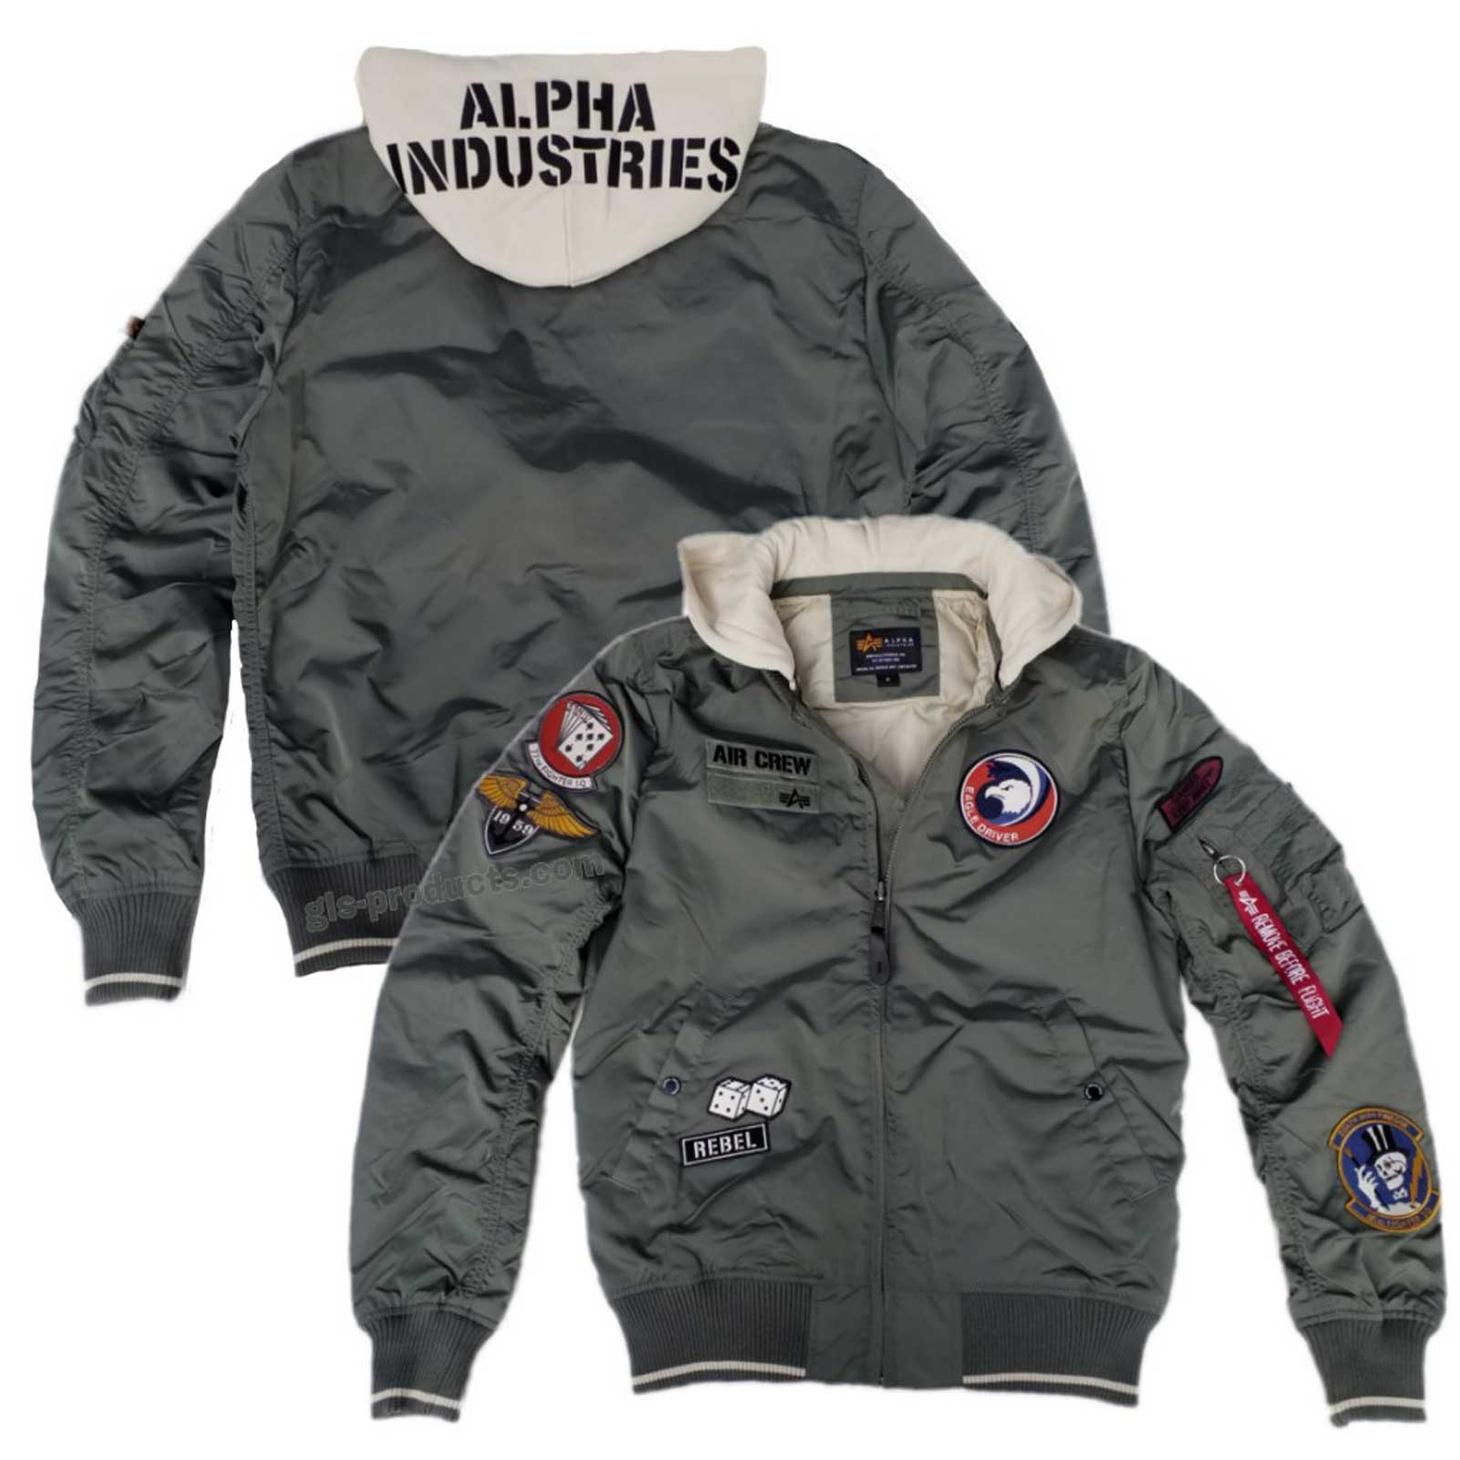 Alpha Industries MA-1 TT Hood Patch 196109 Air Crew